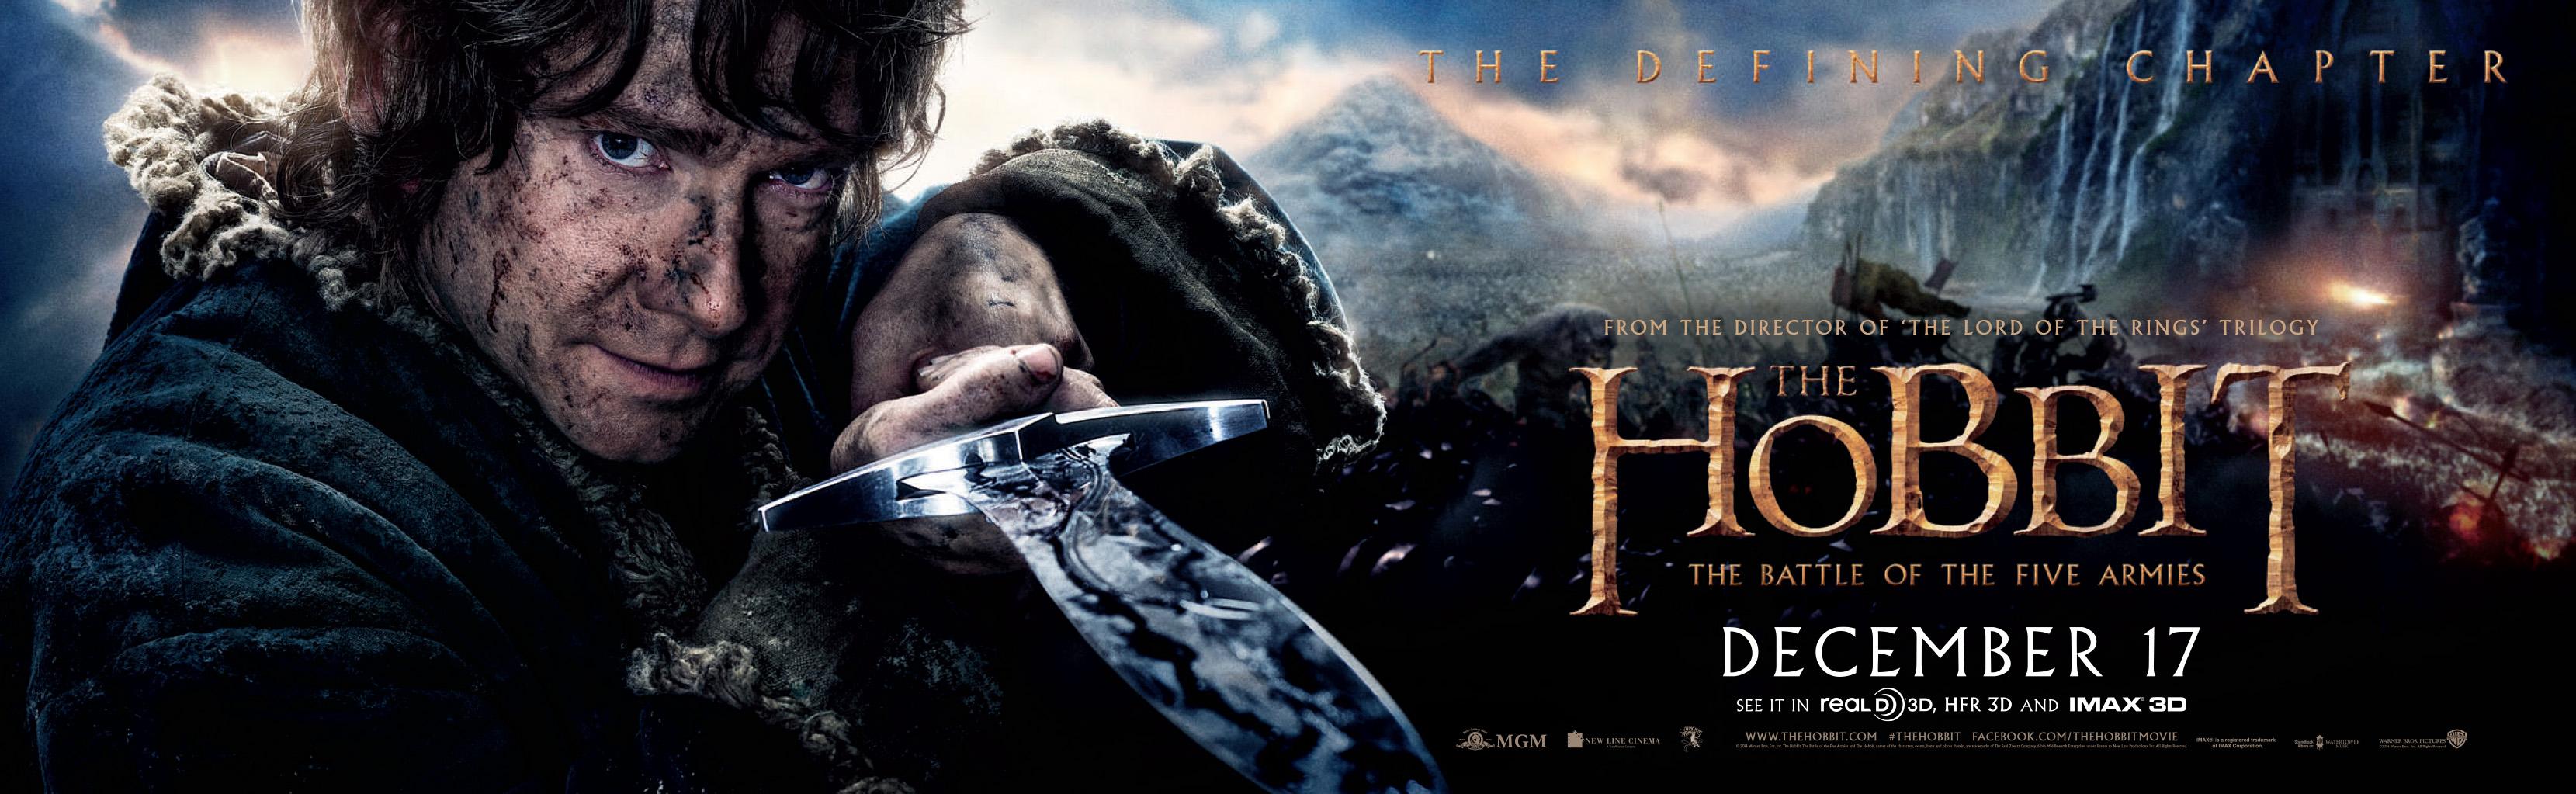 Hobbit - Kampf der drei Heere - Poster lang - Bilbo